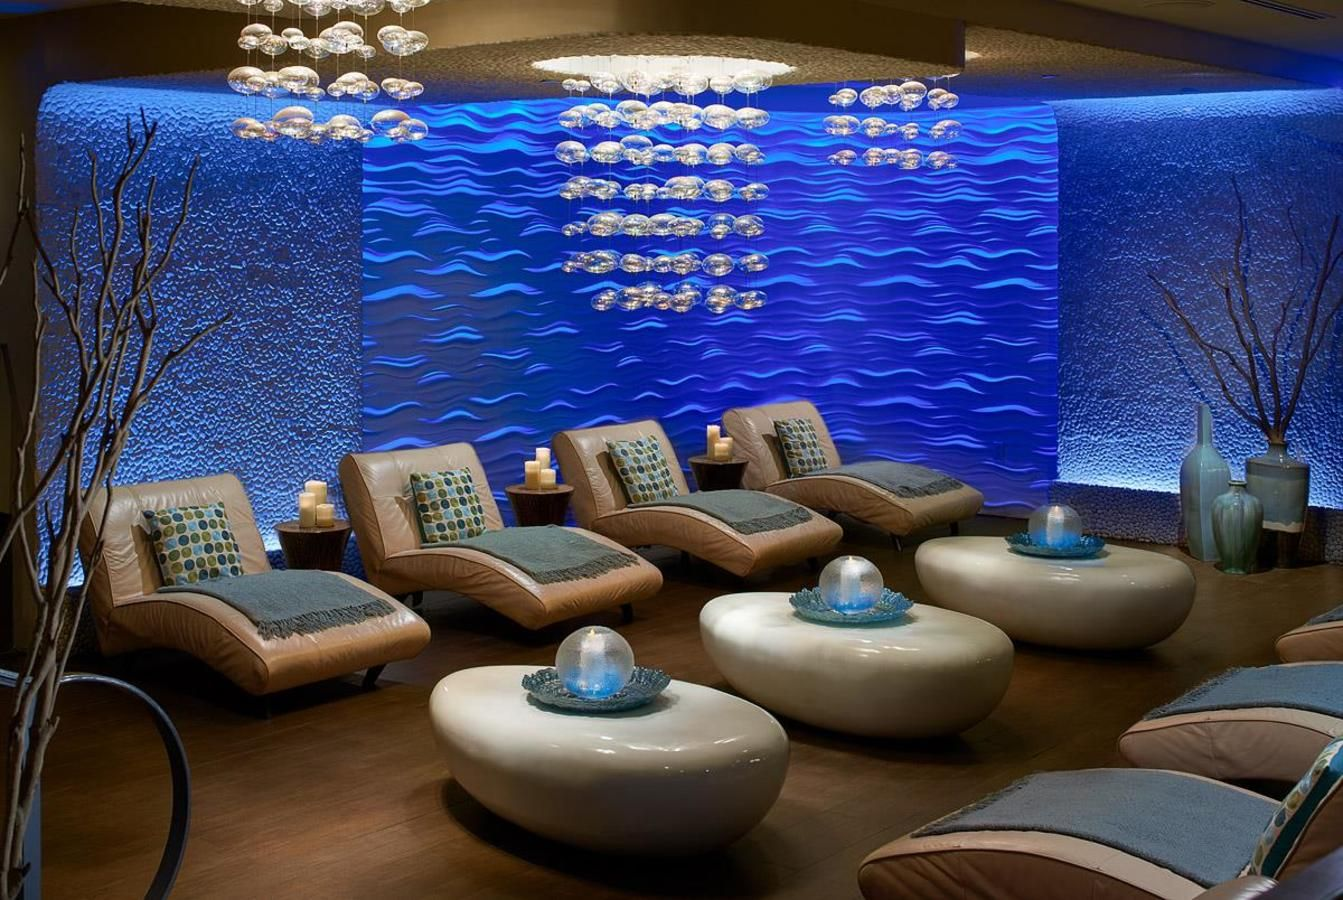 Aveda Seven Seas Spa & Salon Relaxation Lounge